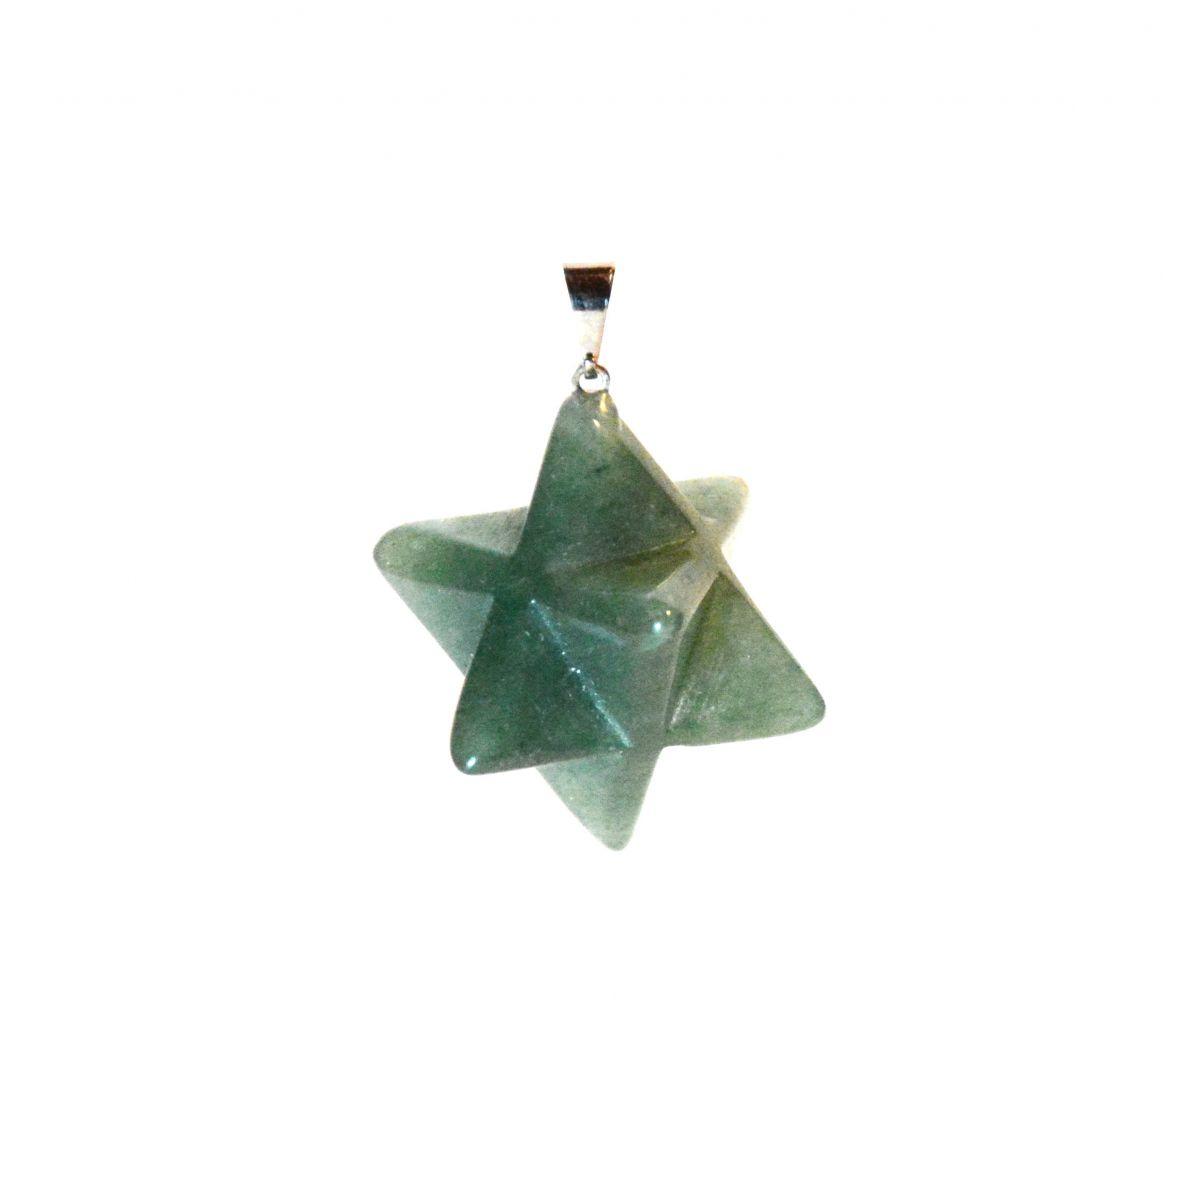 Merkabah - quartzo verde  -  Zots